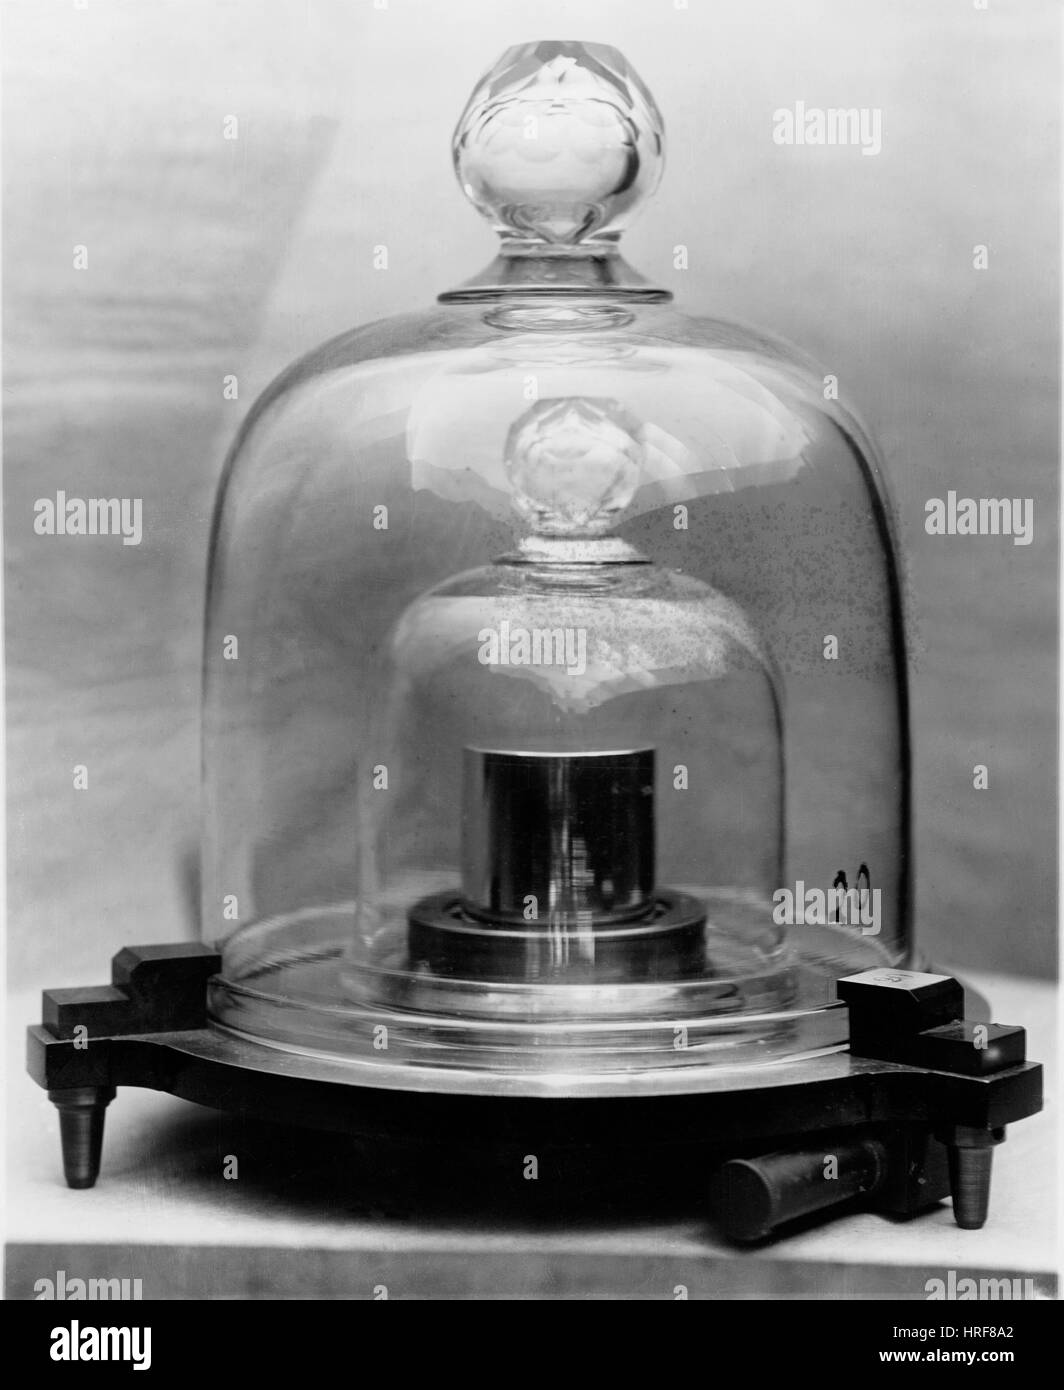 National Standard of Mass, Kilogram - Stock Image